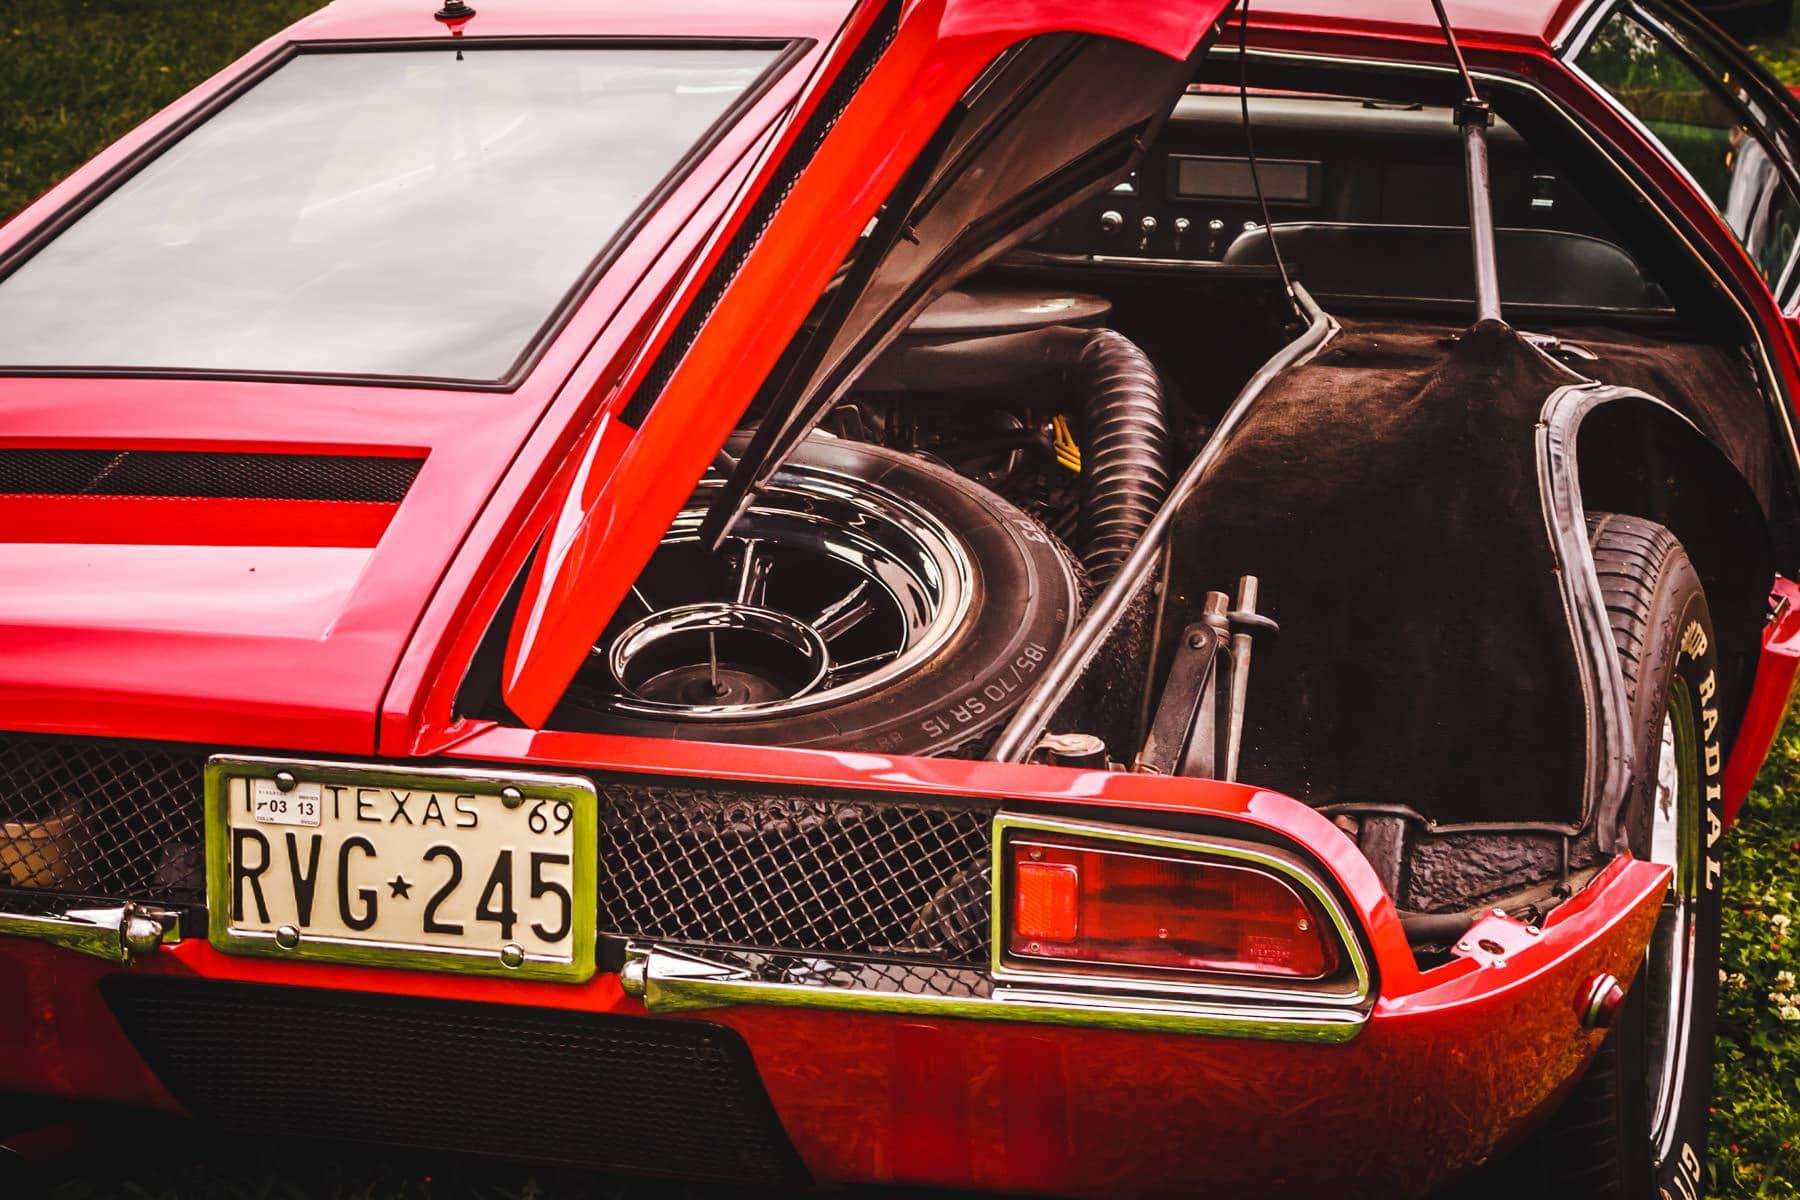 The right rear quarter of a DeTomaso Mangusta at Dallas' All British and European Car Day.